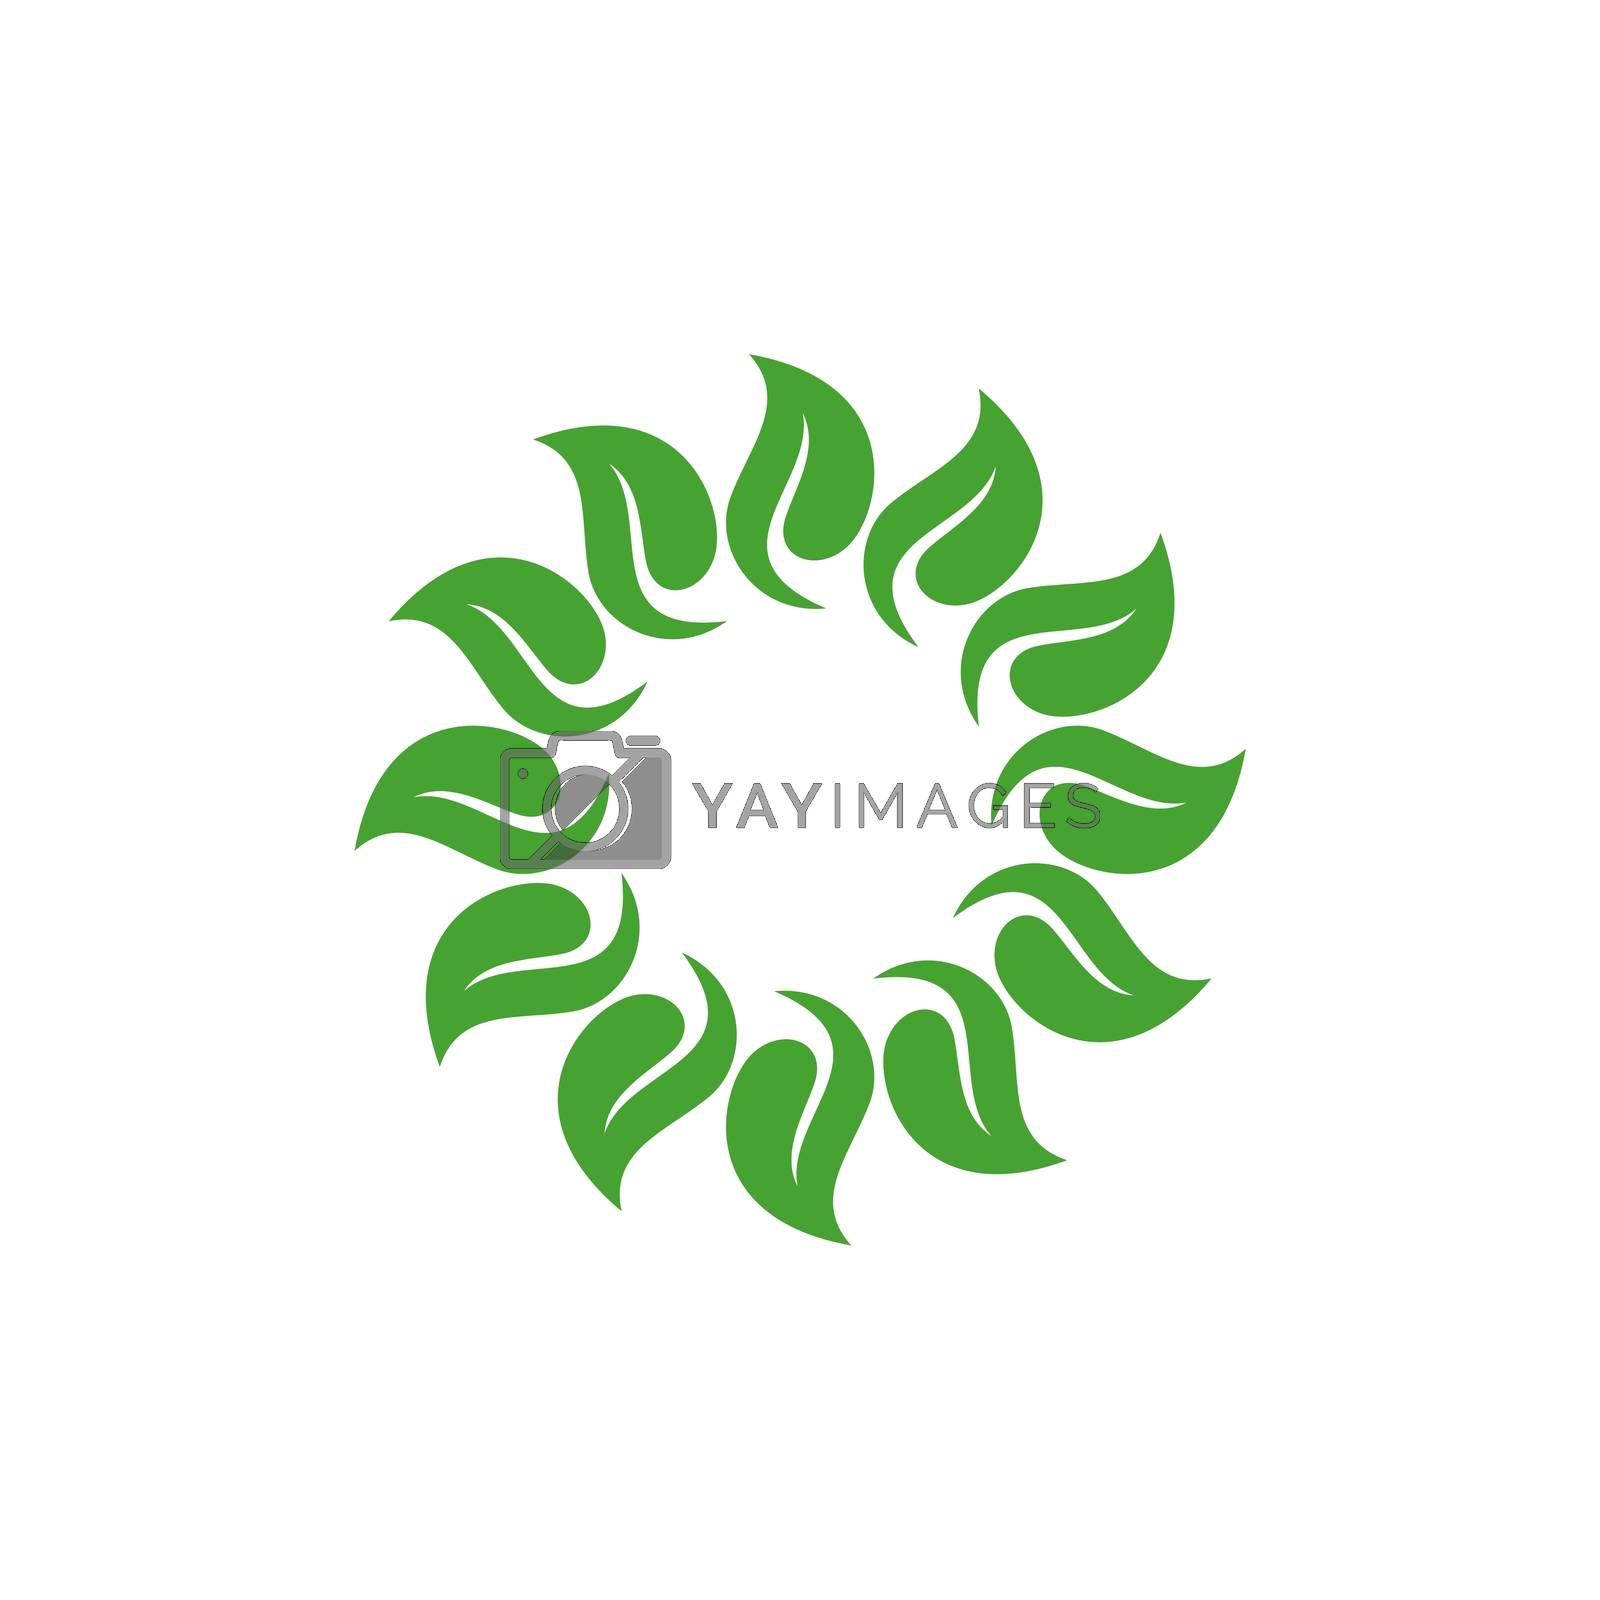 Natural Spa Flower Ornament Logo Template Illustration Design. Vector EPS 10.